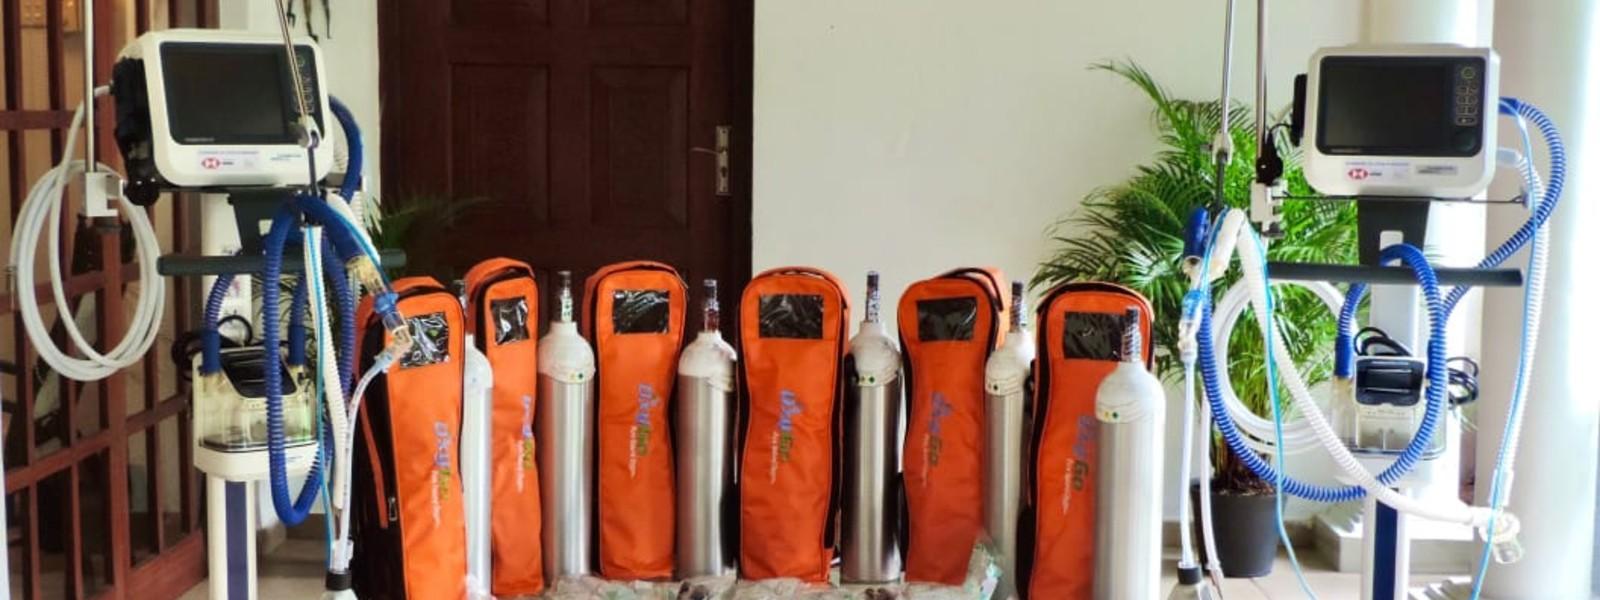 A-PAD Sri Lanka facilitates donation of Rs. 08 Mn worth medical equipment to fight COVID